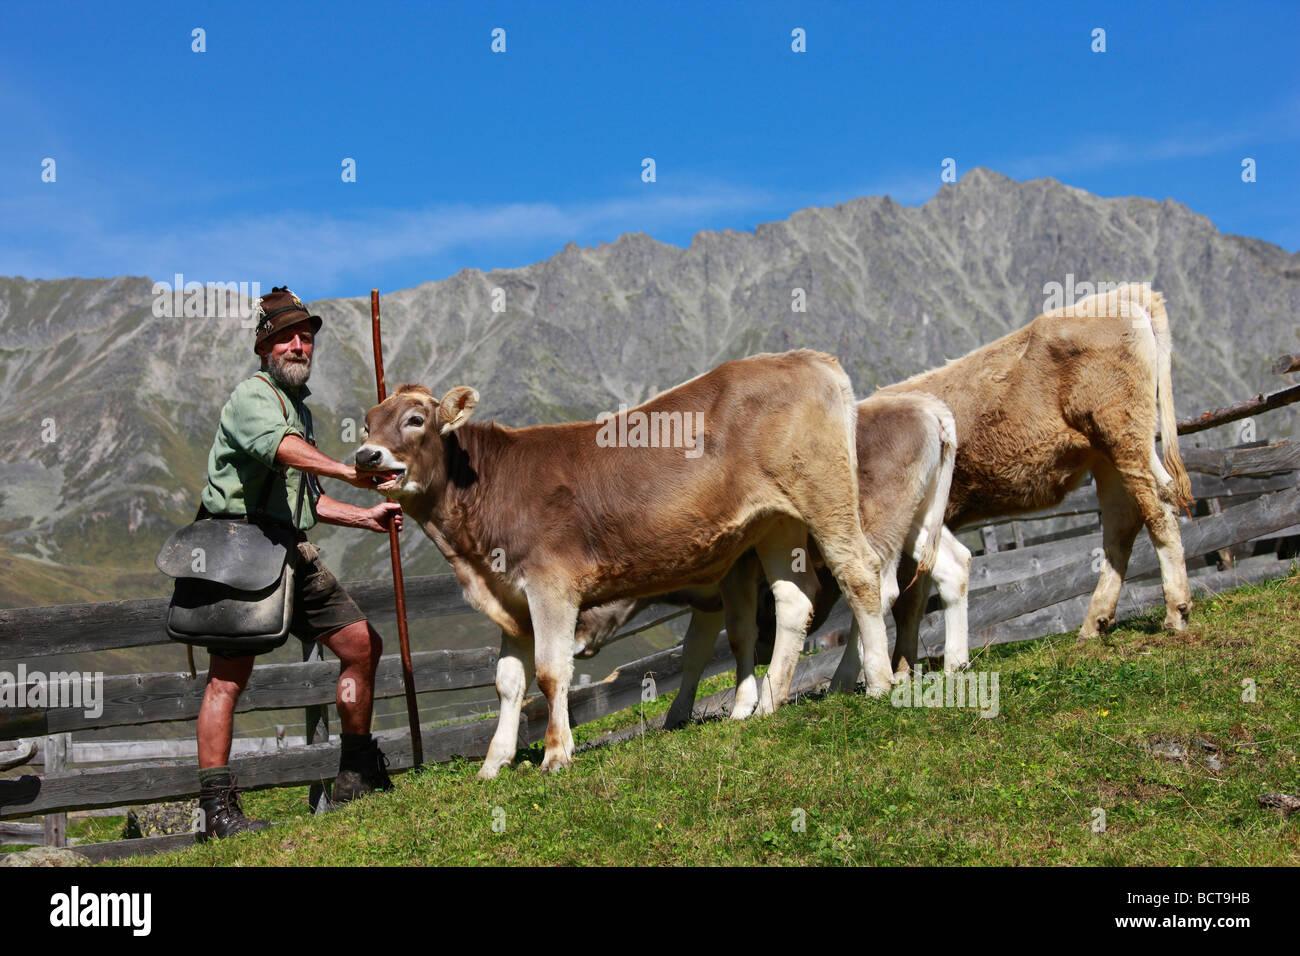 Alp shepherd on the Gleirsch Alm mountain pasture, Sellrain, Sellrain Group, Tyrol, Austria, Europe - Stock Image